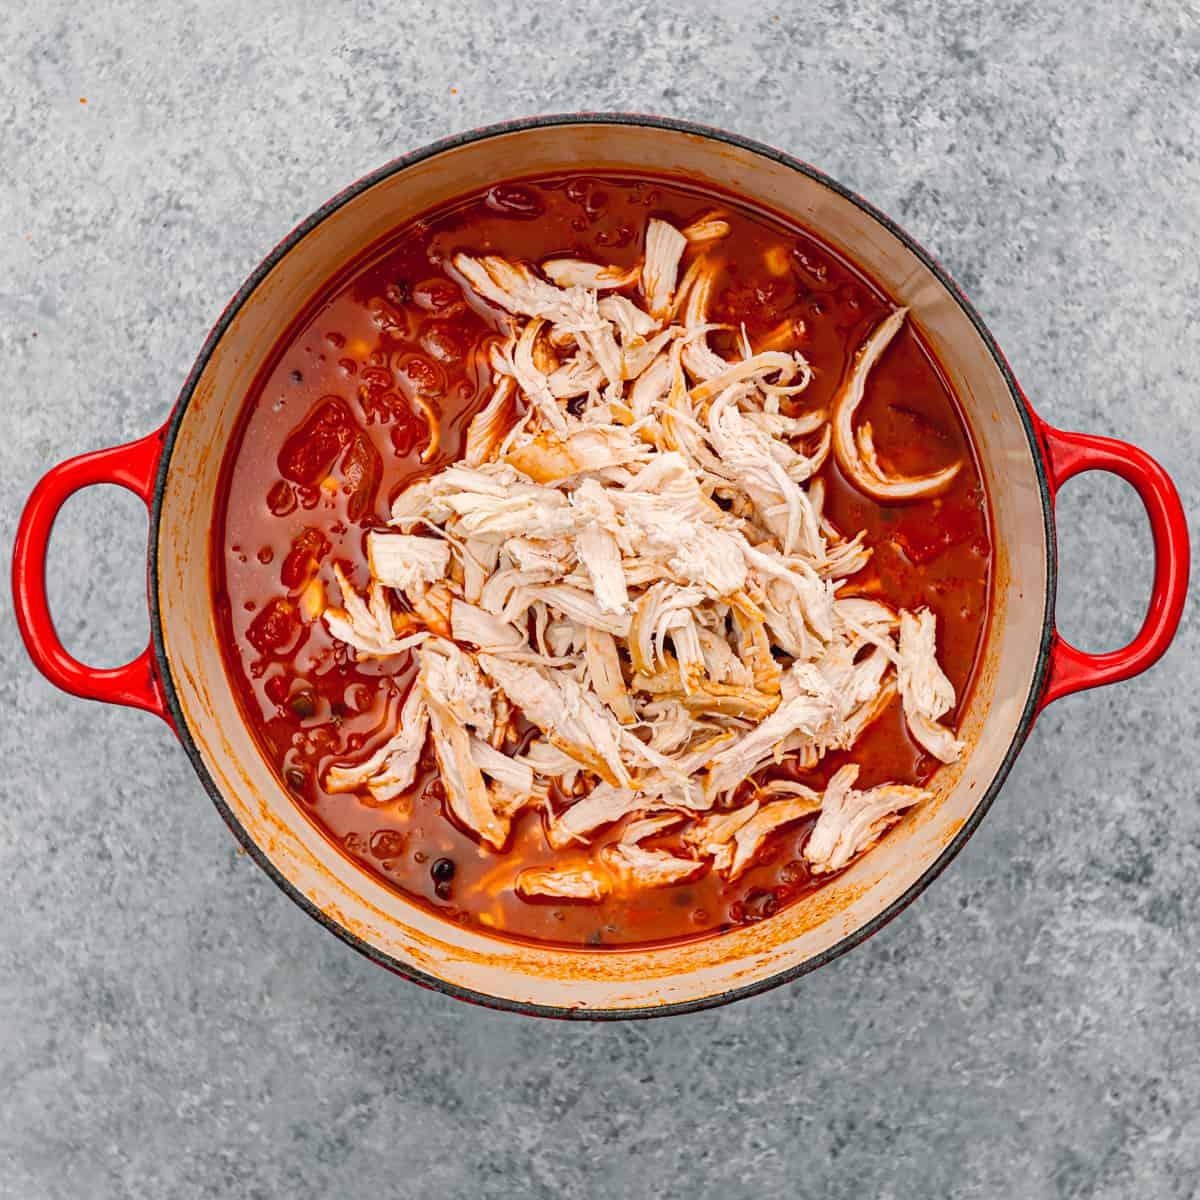 shredded chicken in a soup.